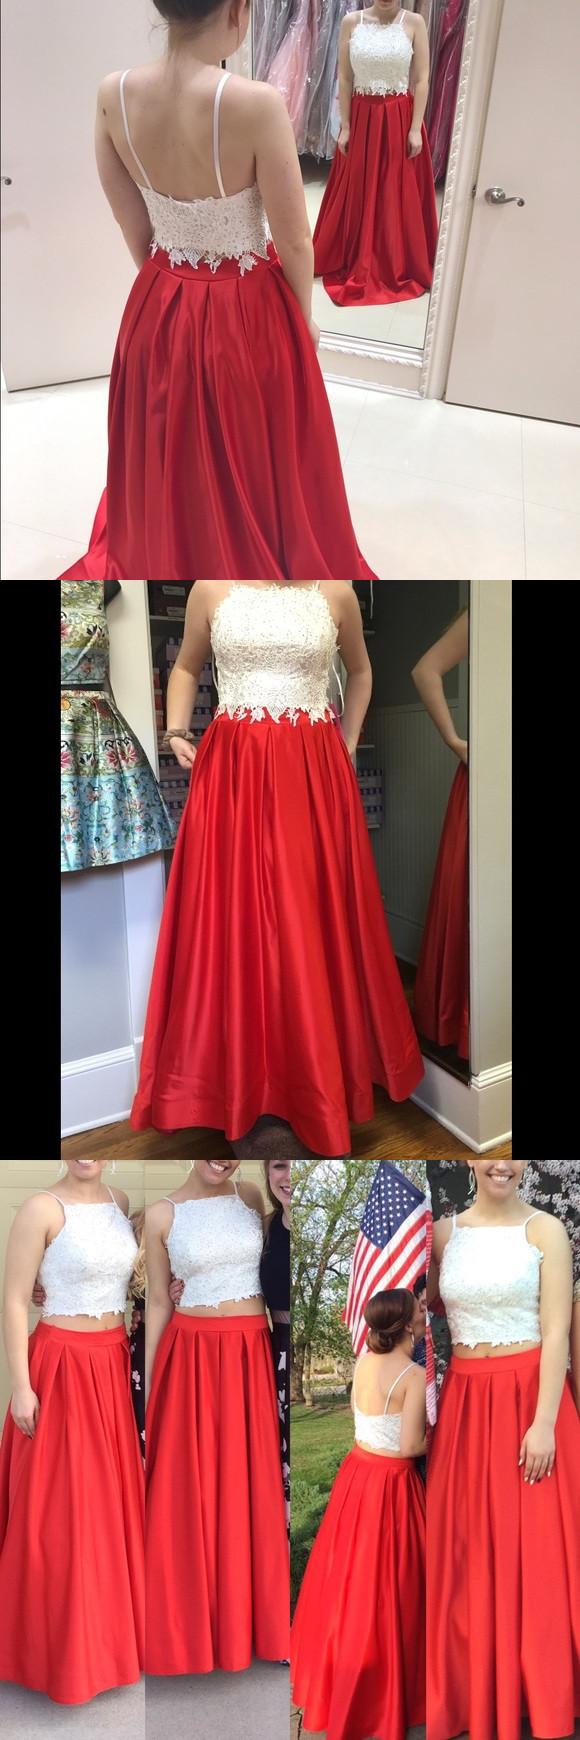 Straps v neck burgundy long prom dress from modsele s beautiful